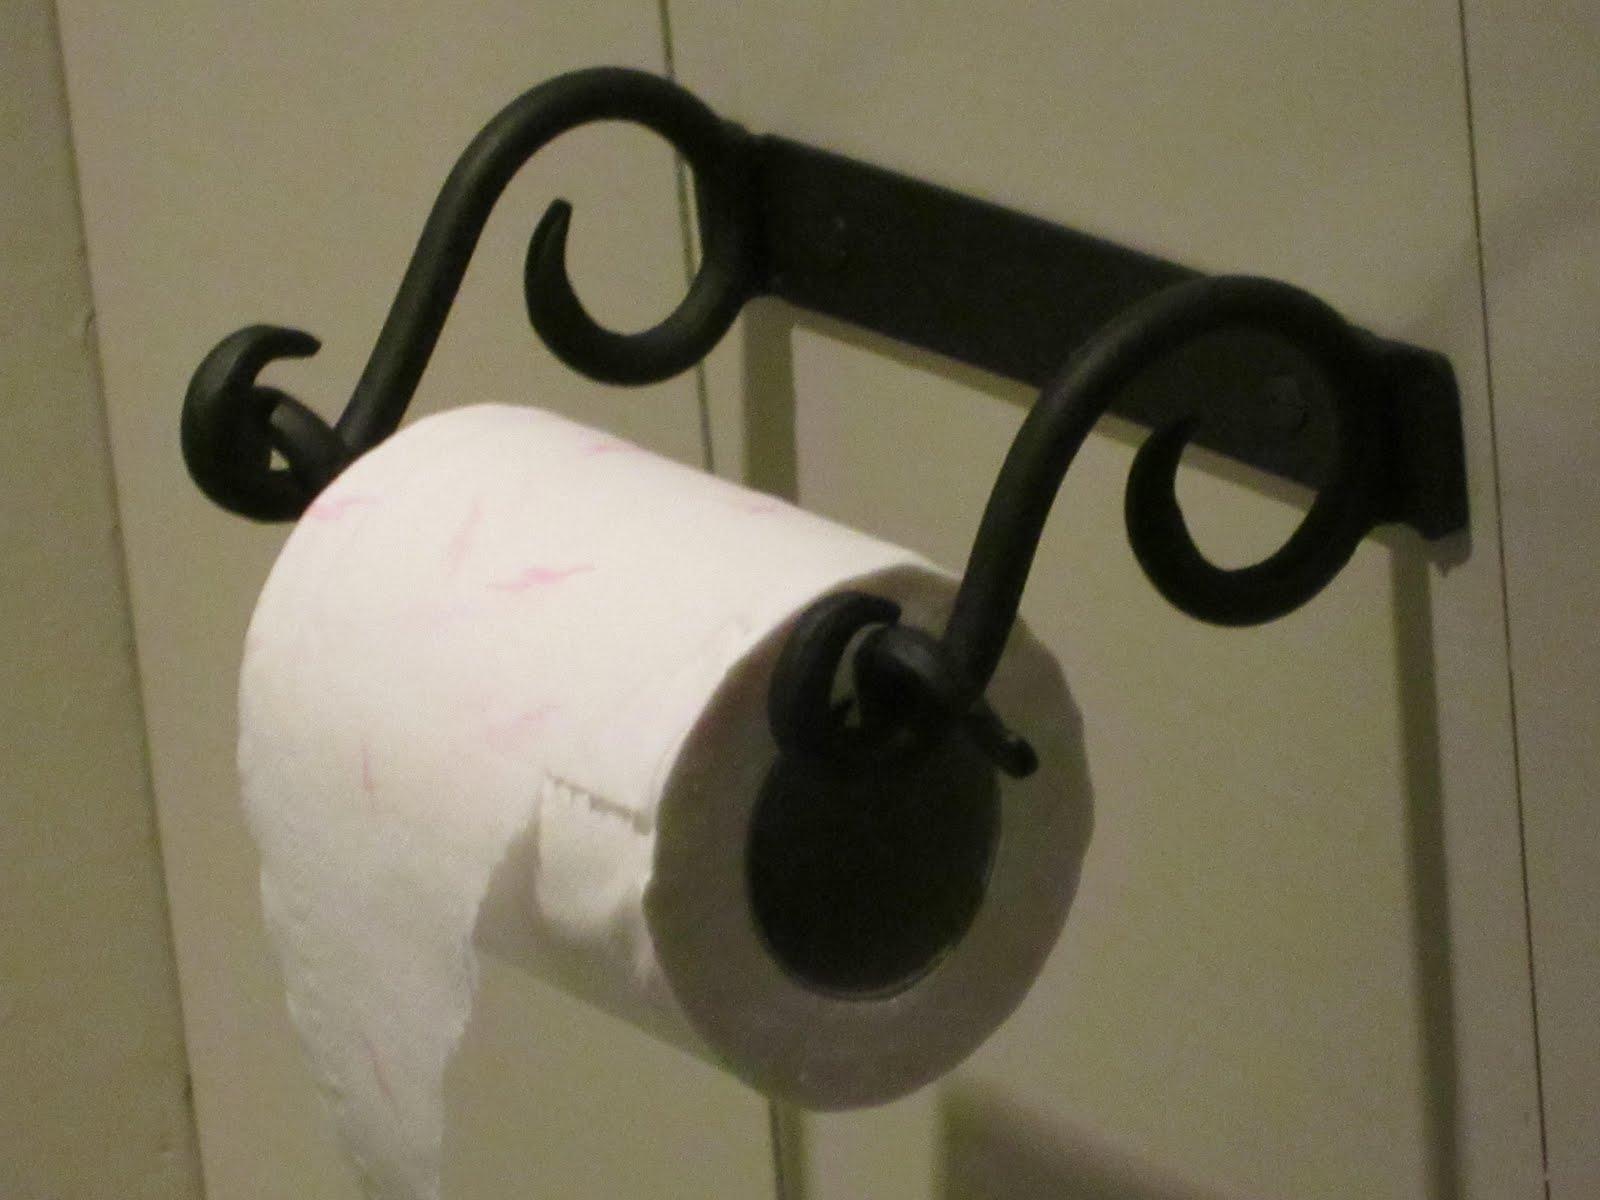 Toilet Accessoires Zwart : Wc rolhouder ikea grundtal toilet roll stand stainless steel ikea